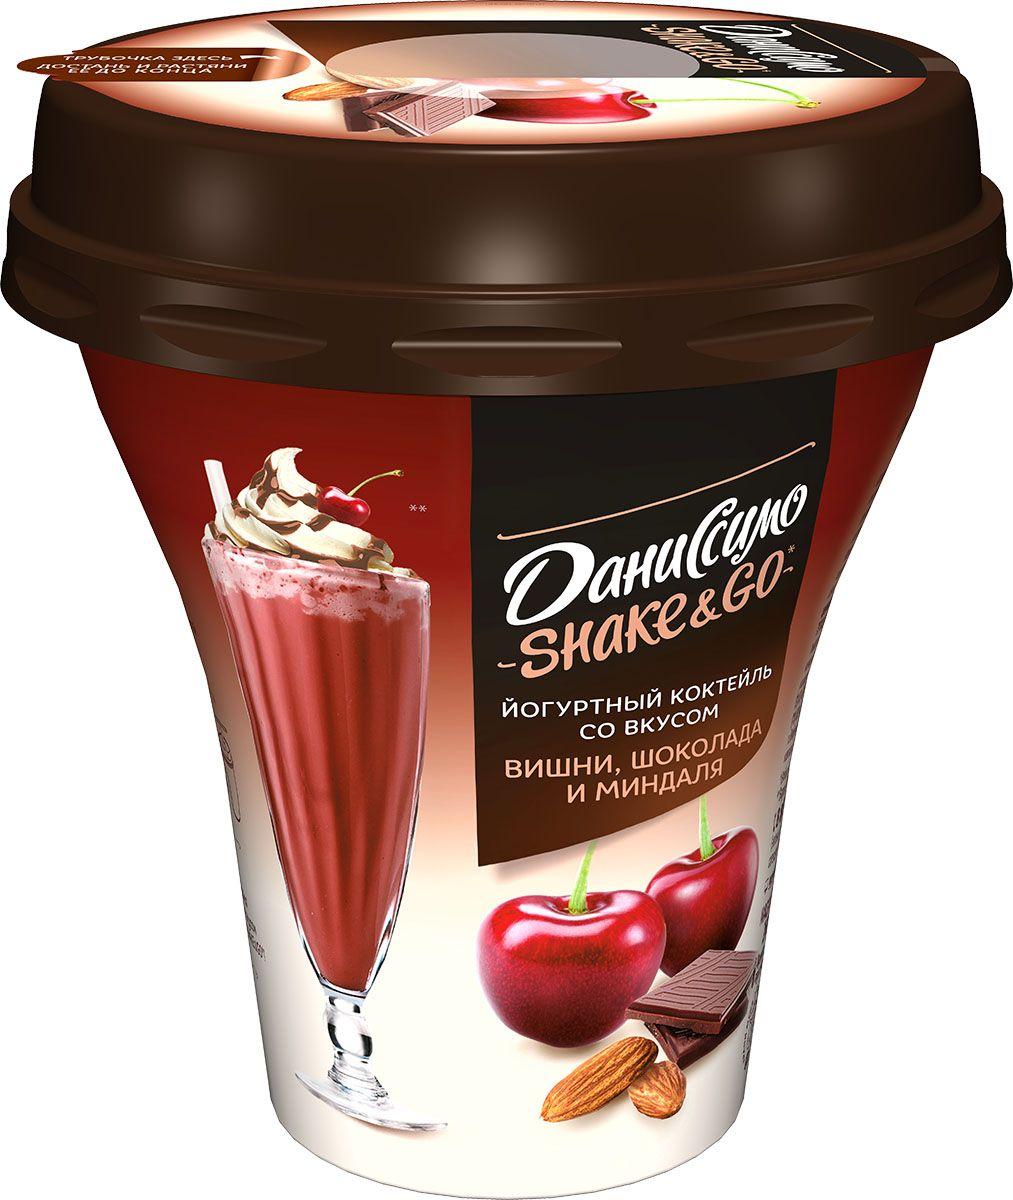 Даниссимо Shake&Go Йогуртный коктейль Вишня, Шоколад и Миндаль 5,2%, 260 г цена 2017